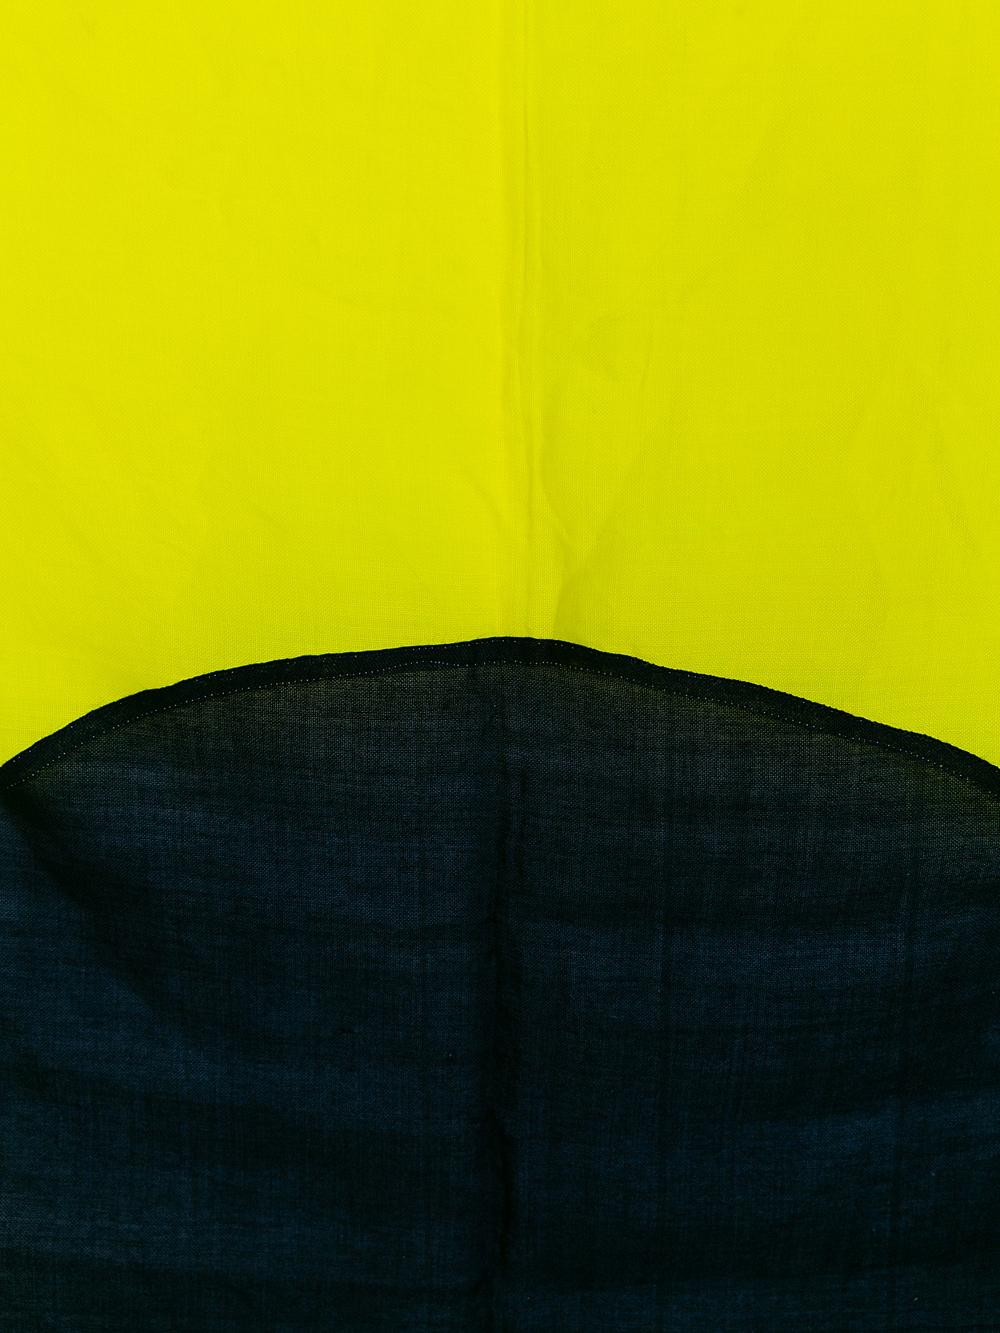 Signal Flag I #5920